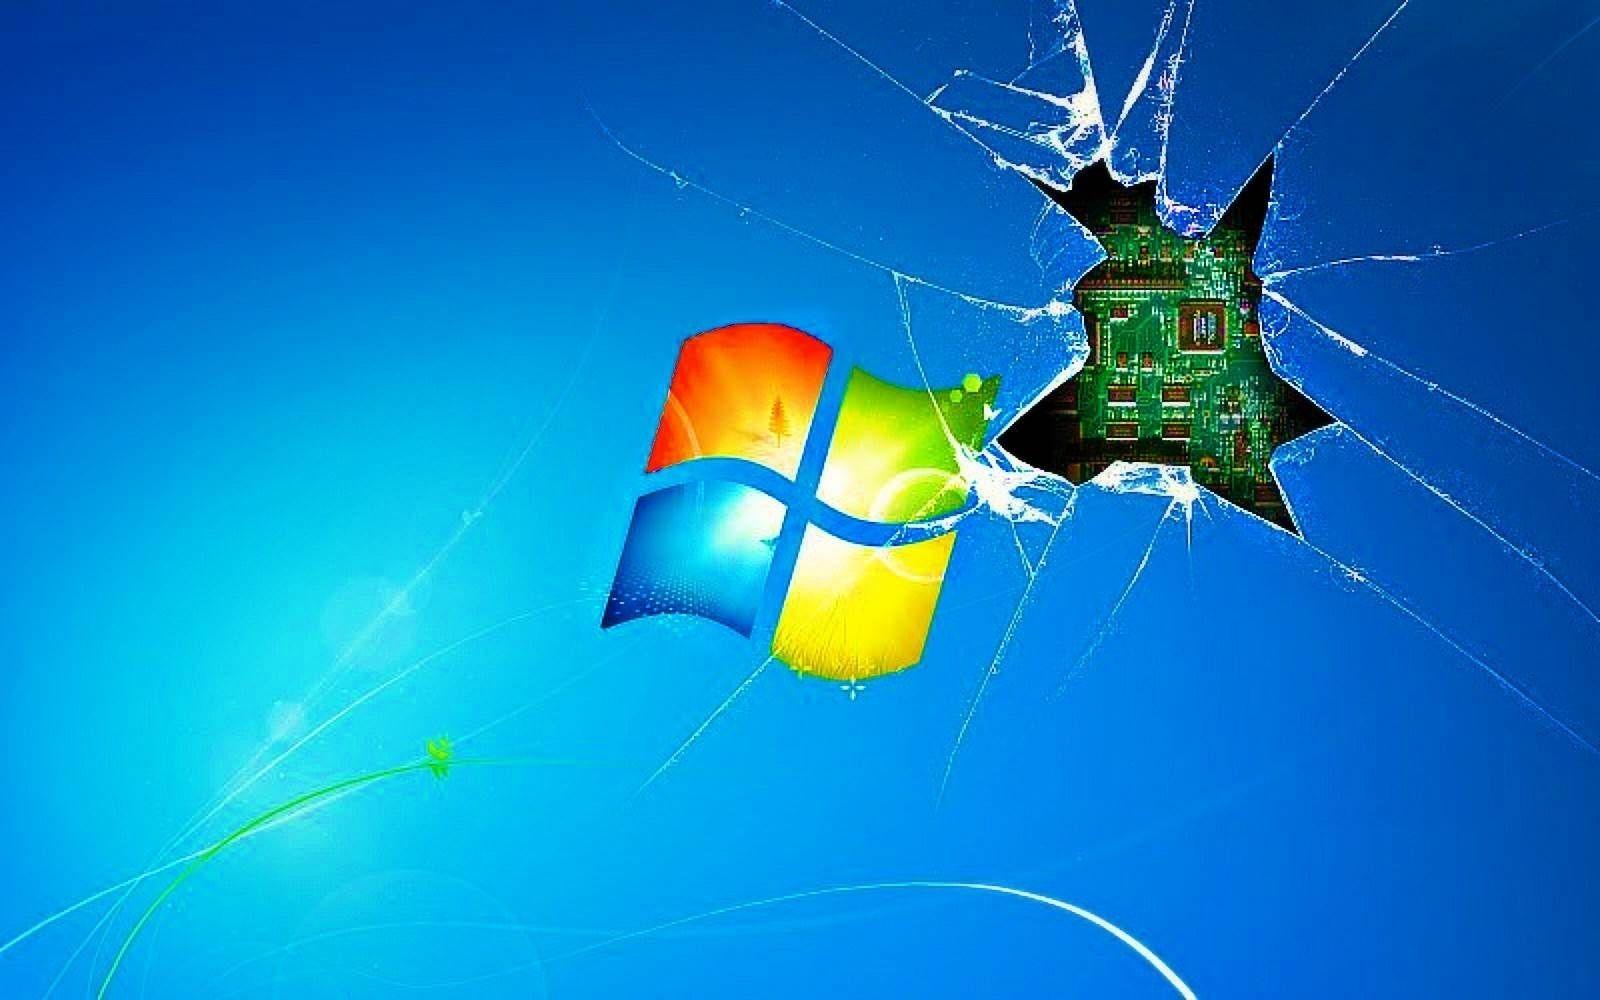 Cracked Screen Wallpaper Windows Best Wallpaper Hd Computer Screen Wallpaper Minecraft Wallpaper Broken Glass Wallpaper